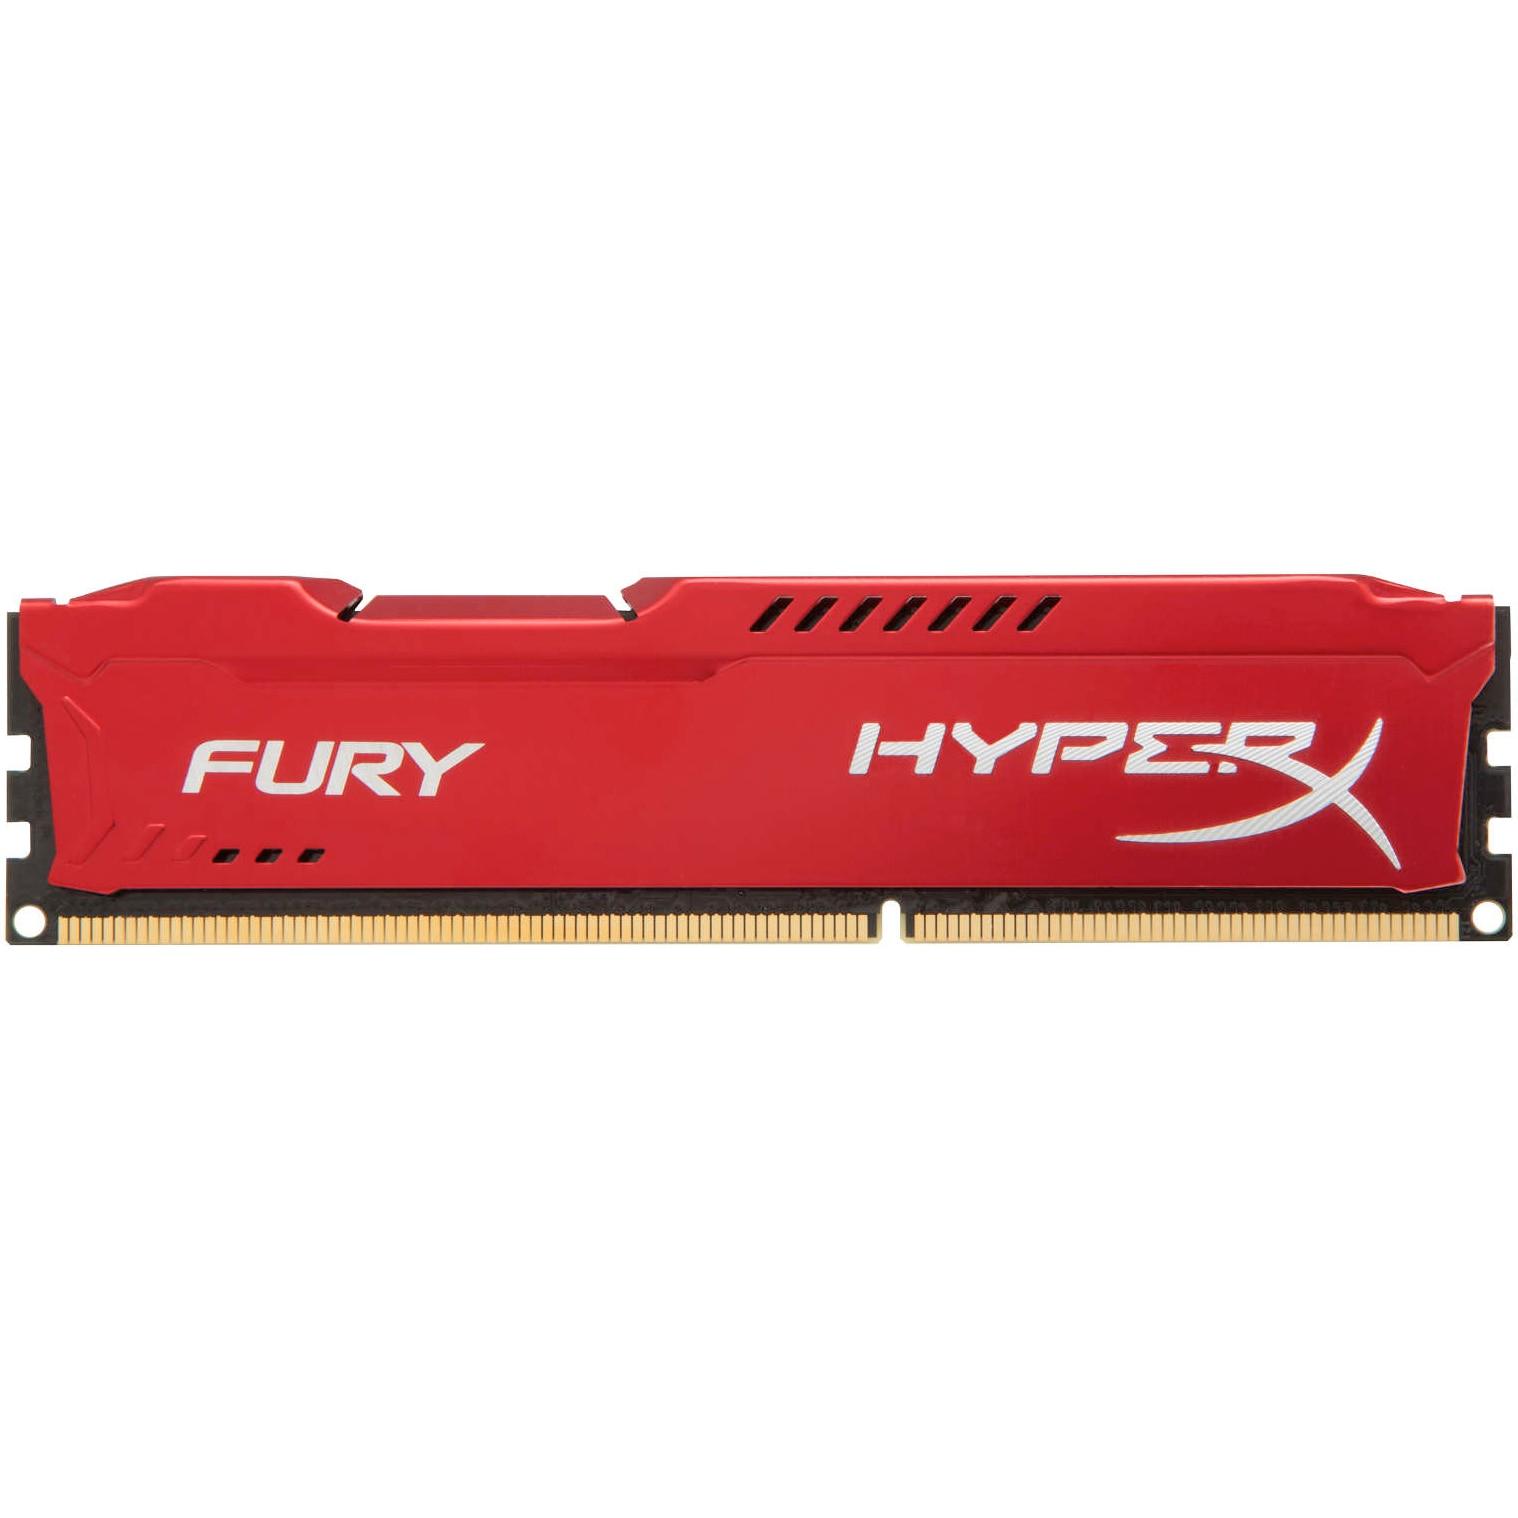 Fotografie Memorie HyperX FURY Red 4GB, DDR3, 1600MHz, CL10, 1.5V